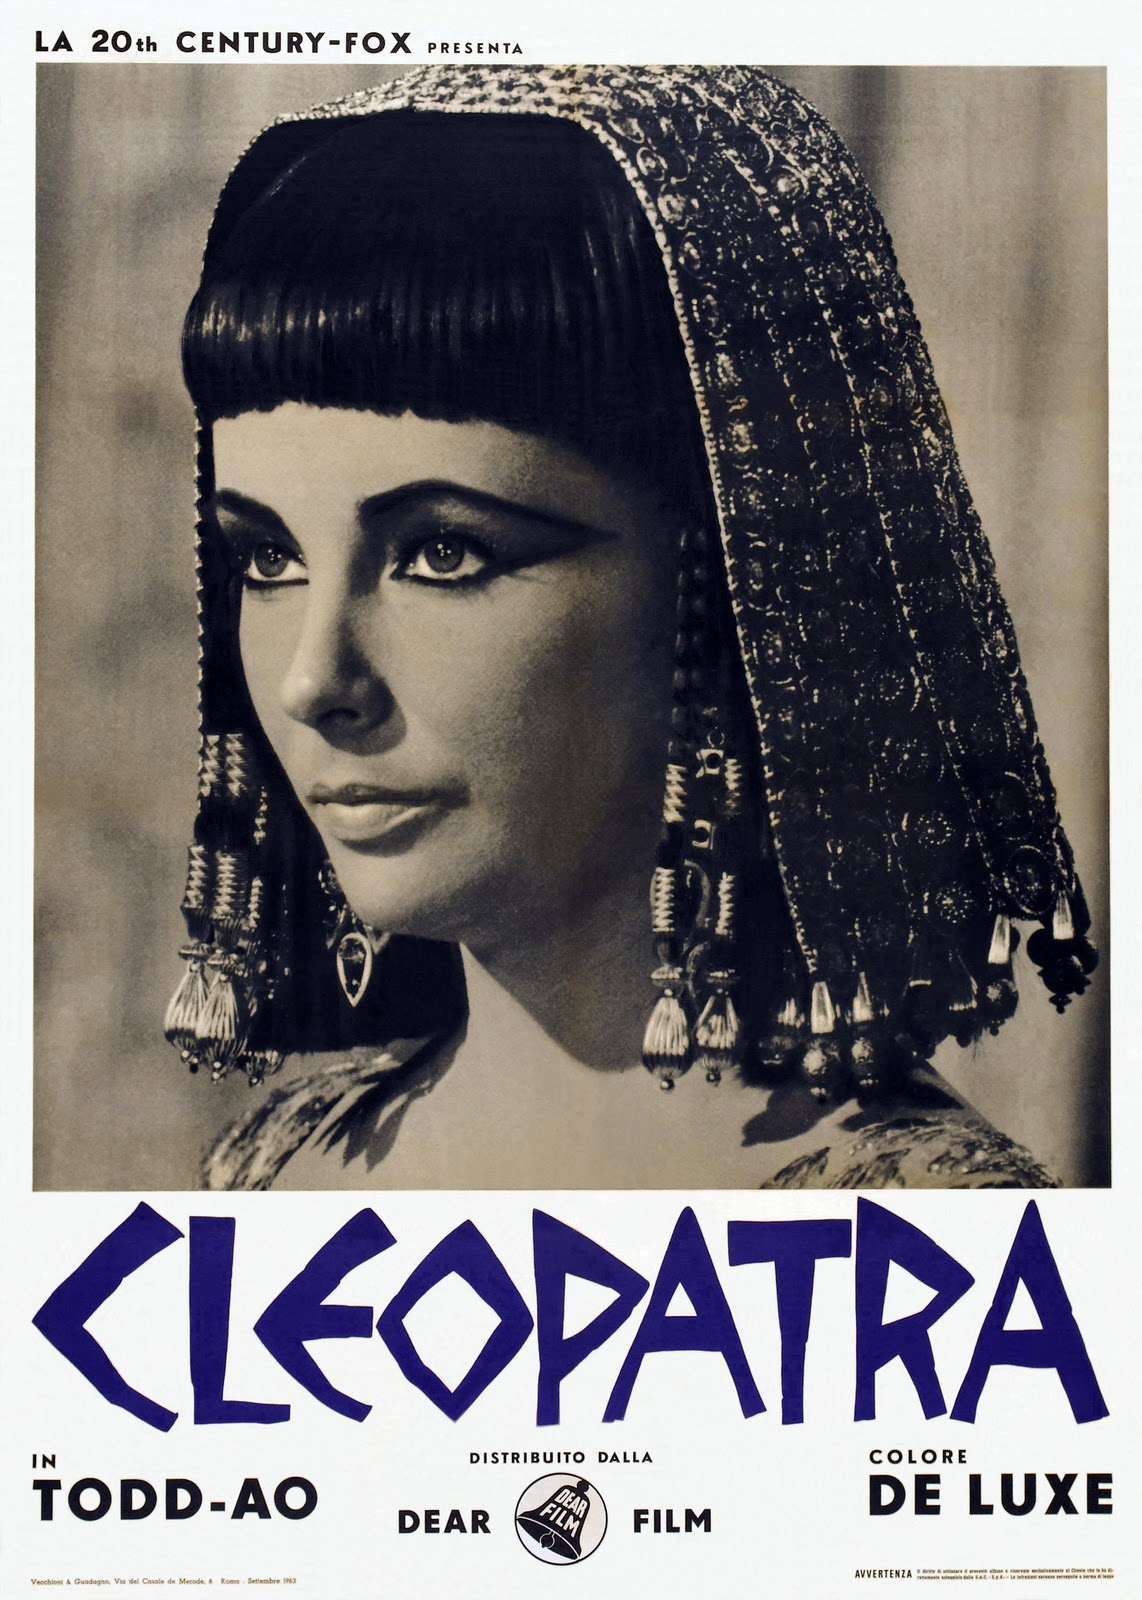 http://1.bp.blogspot.com/-ohsU2t8q5WI/TybzMxByVPI/AAAAAAAADOQ/CKo6oCPTZdg/s1600/zz+Cleopatra-1963-elizabeth-taylor-16282357-1828-2560.jpg